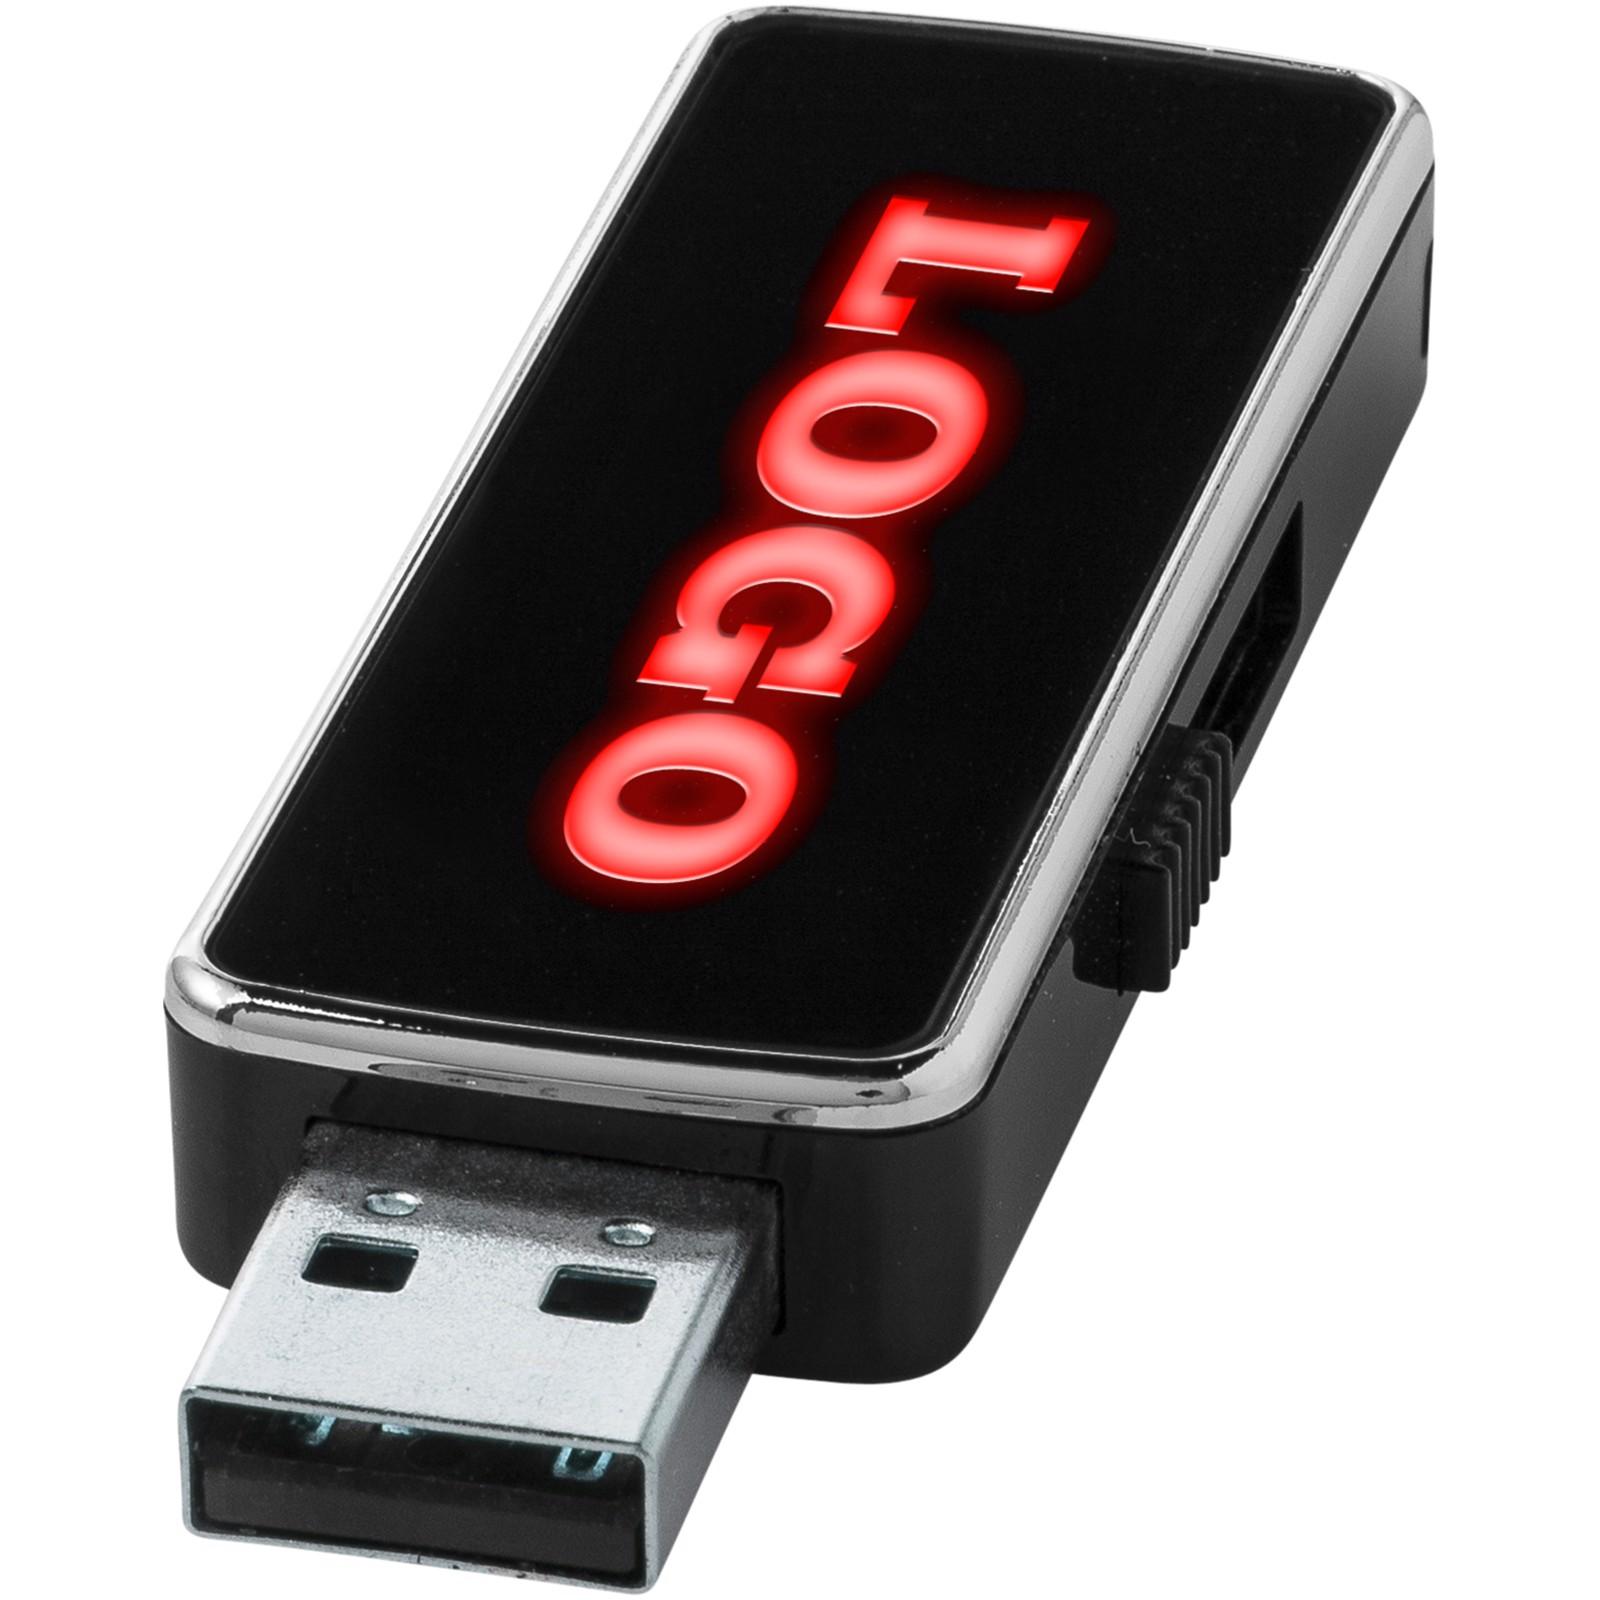 Light Up USB stick - Solid black / Red / 2GB